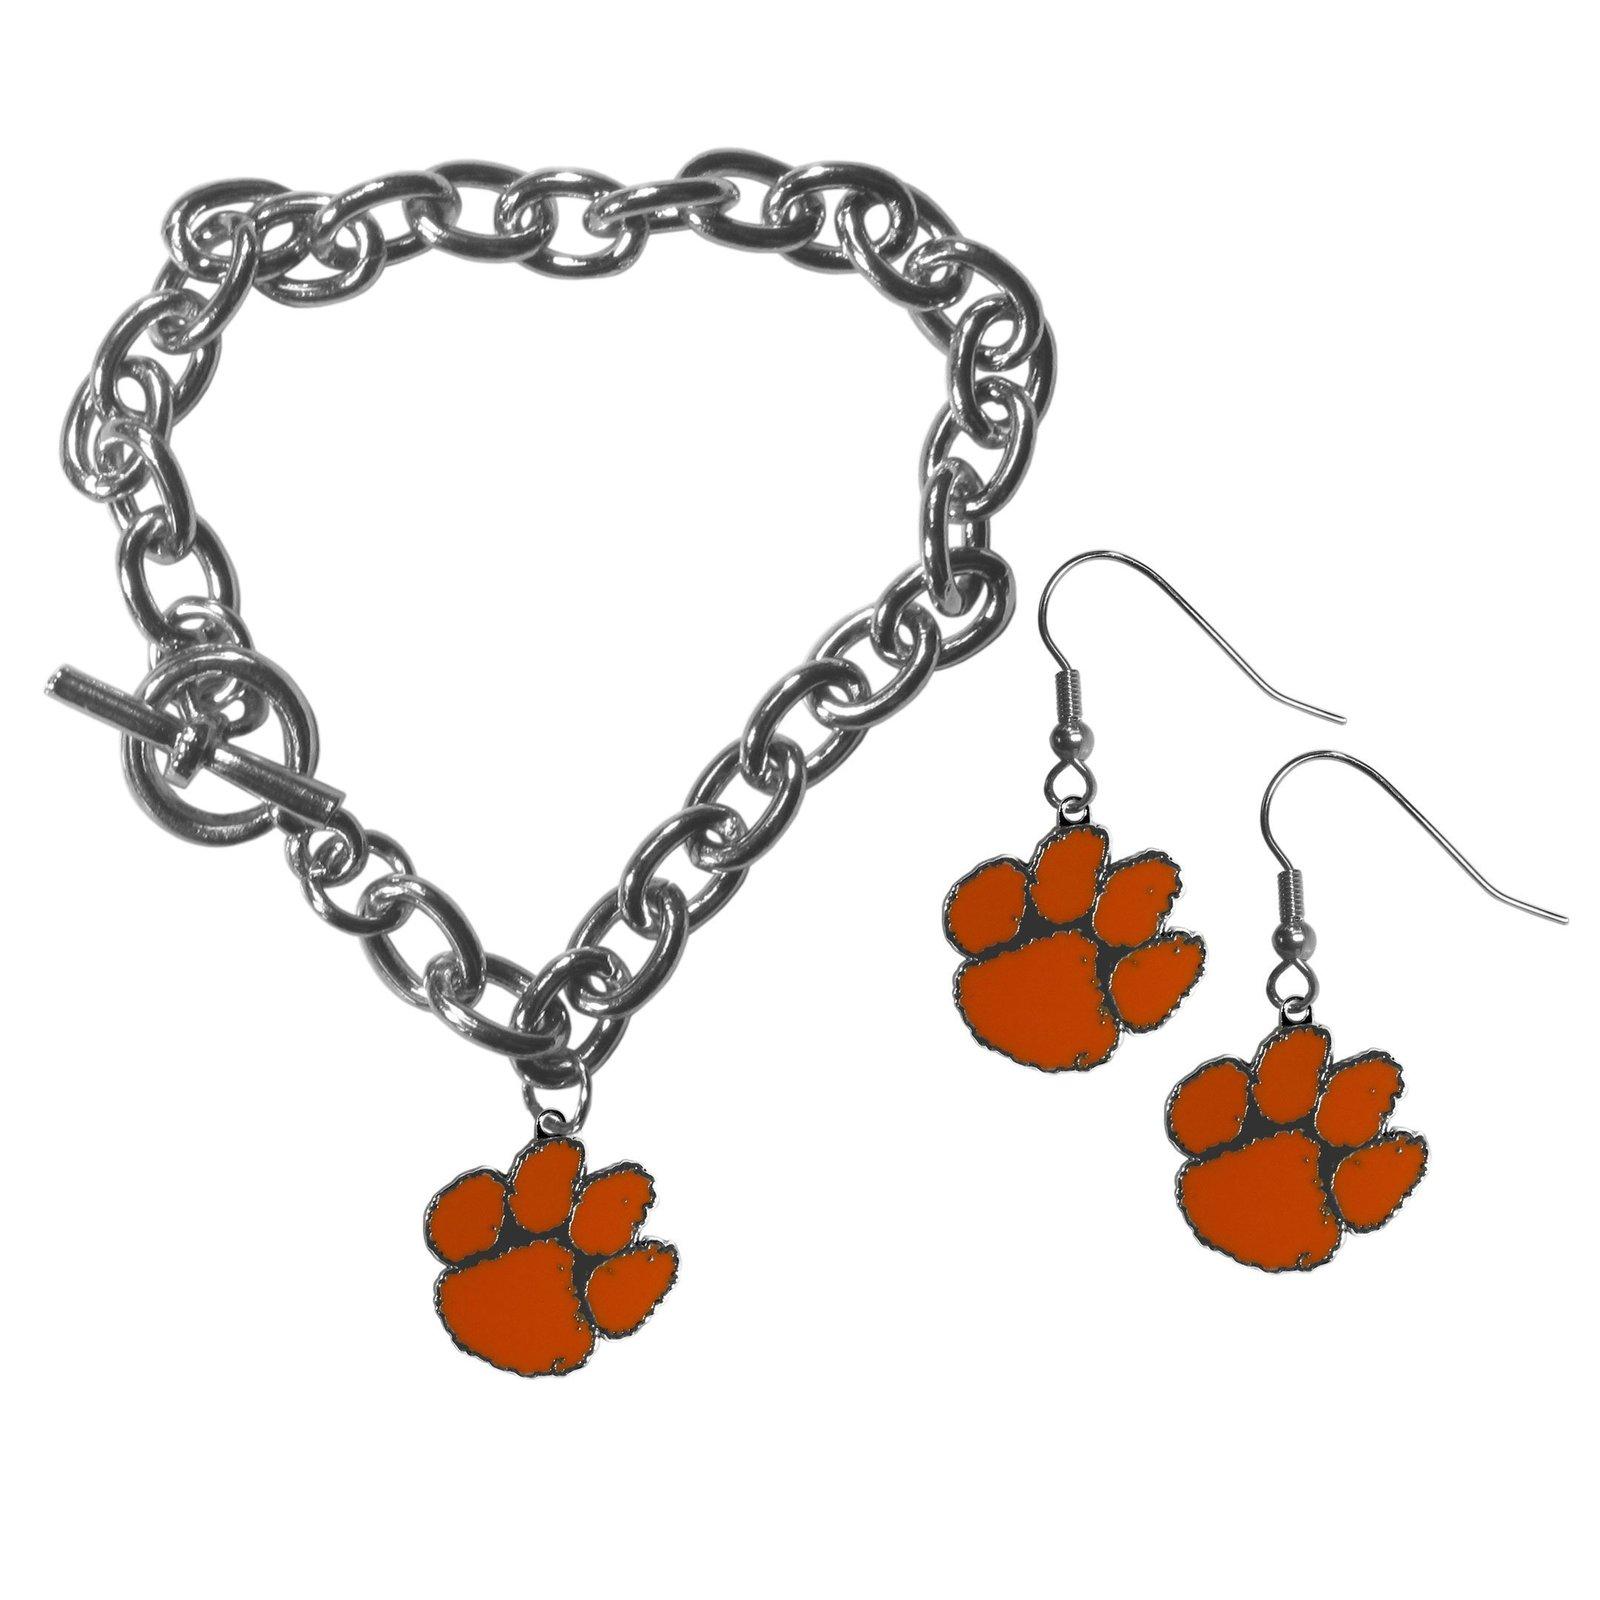 Ncaa clemson tigers chain bracelet and dangle earring set default title jademoghul 3656867905640